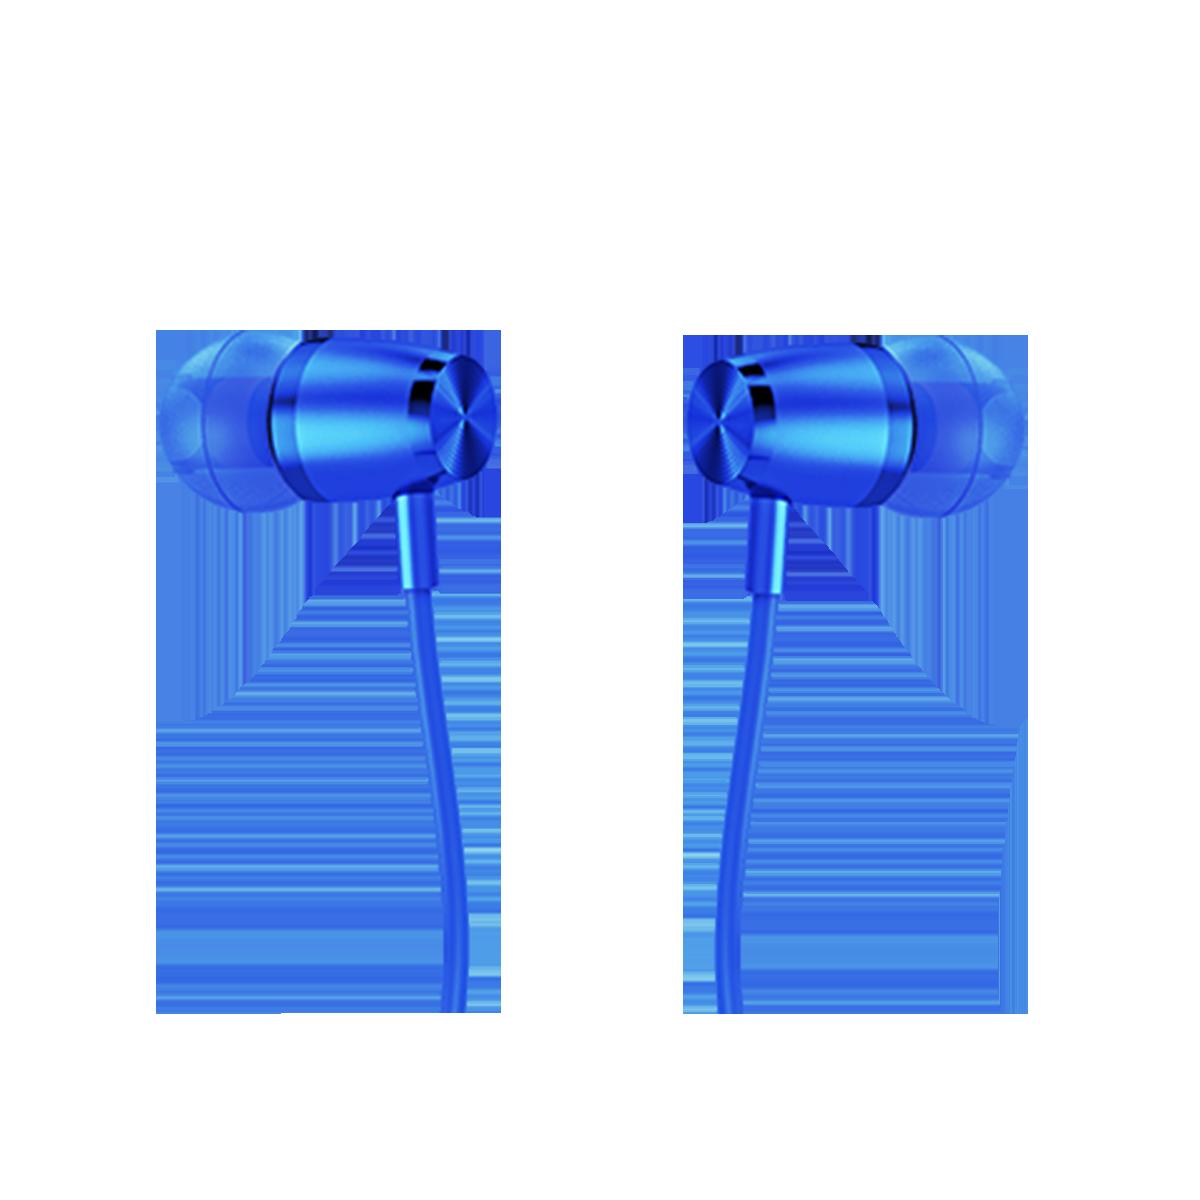 LUMIFORD XP60 Wireless Earphones